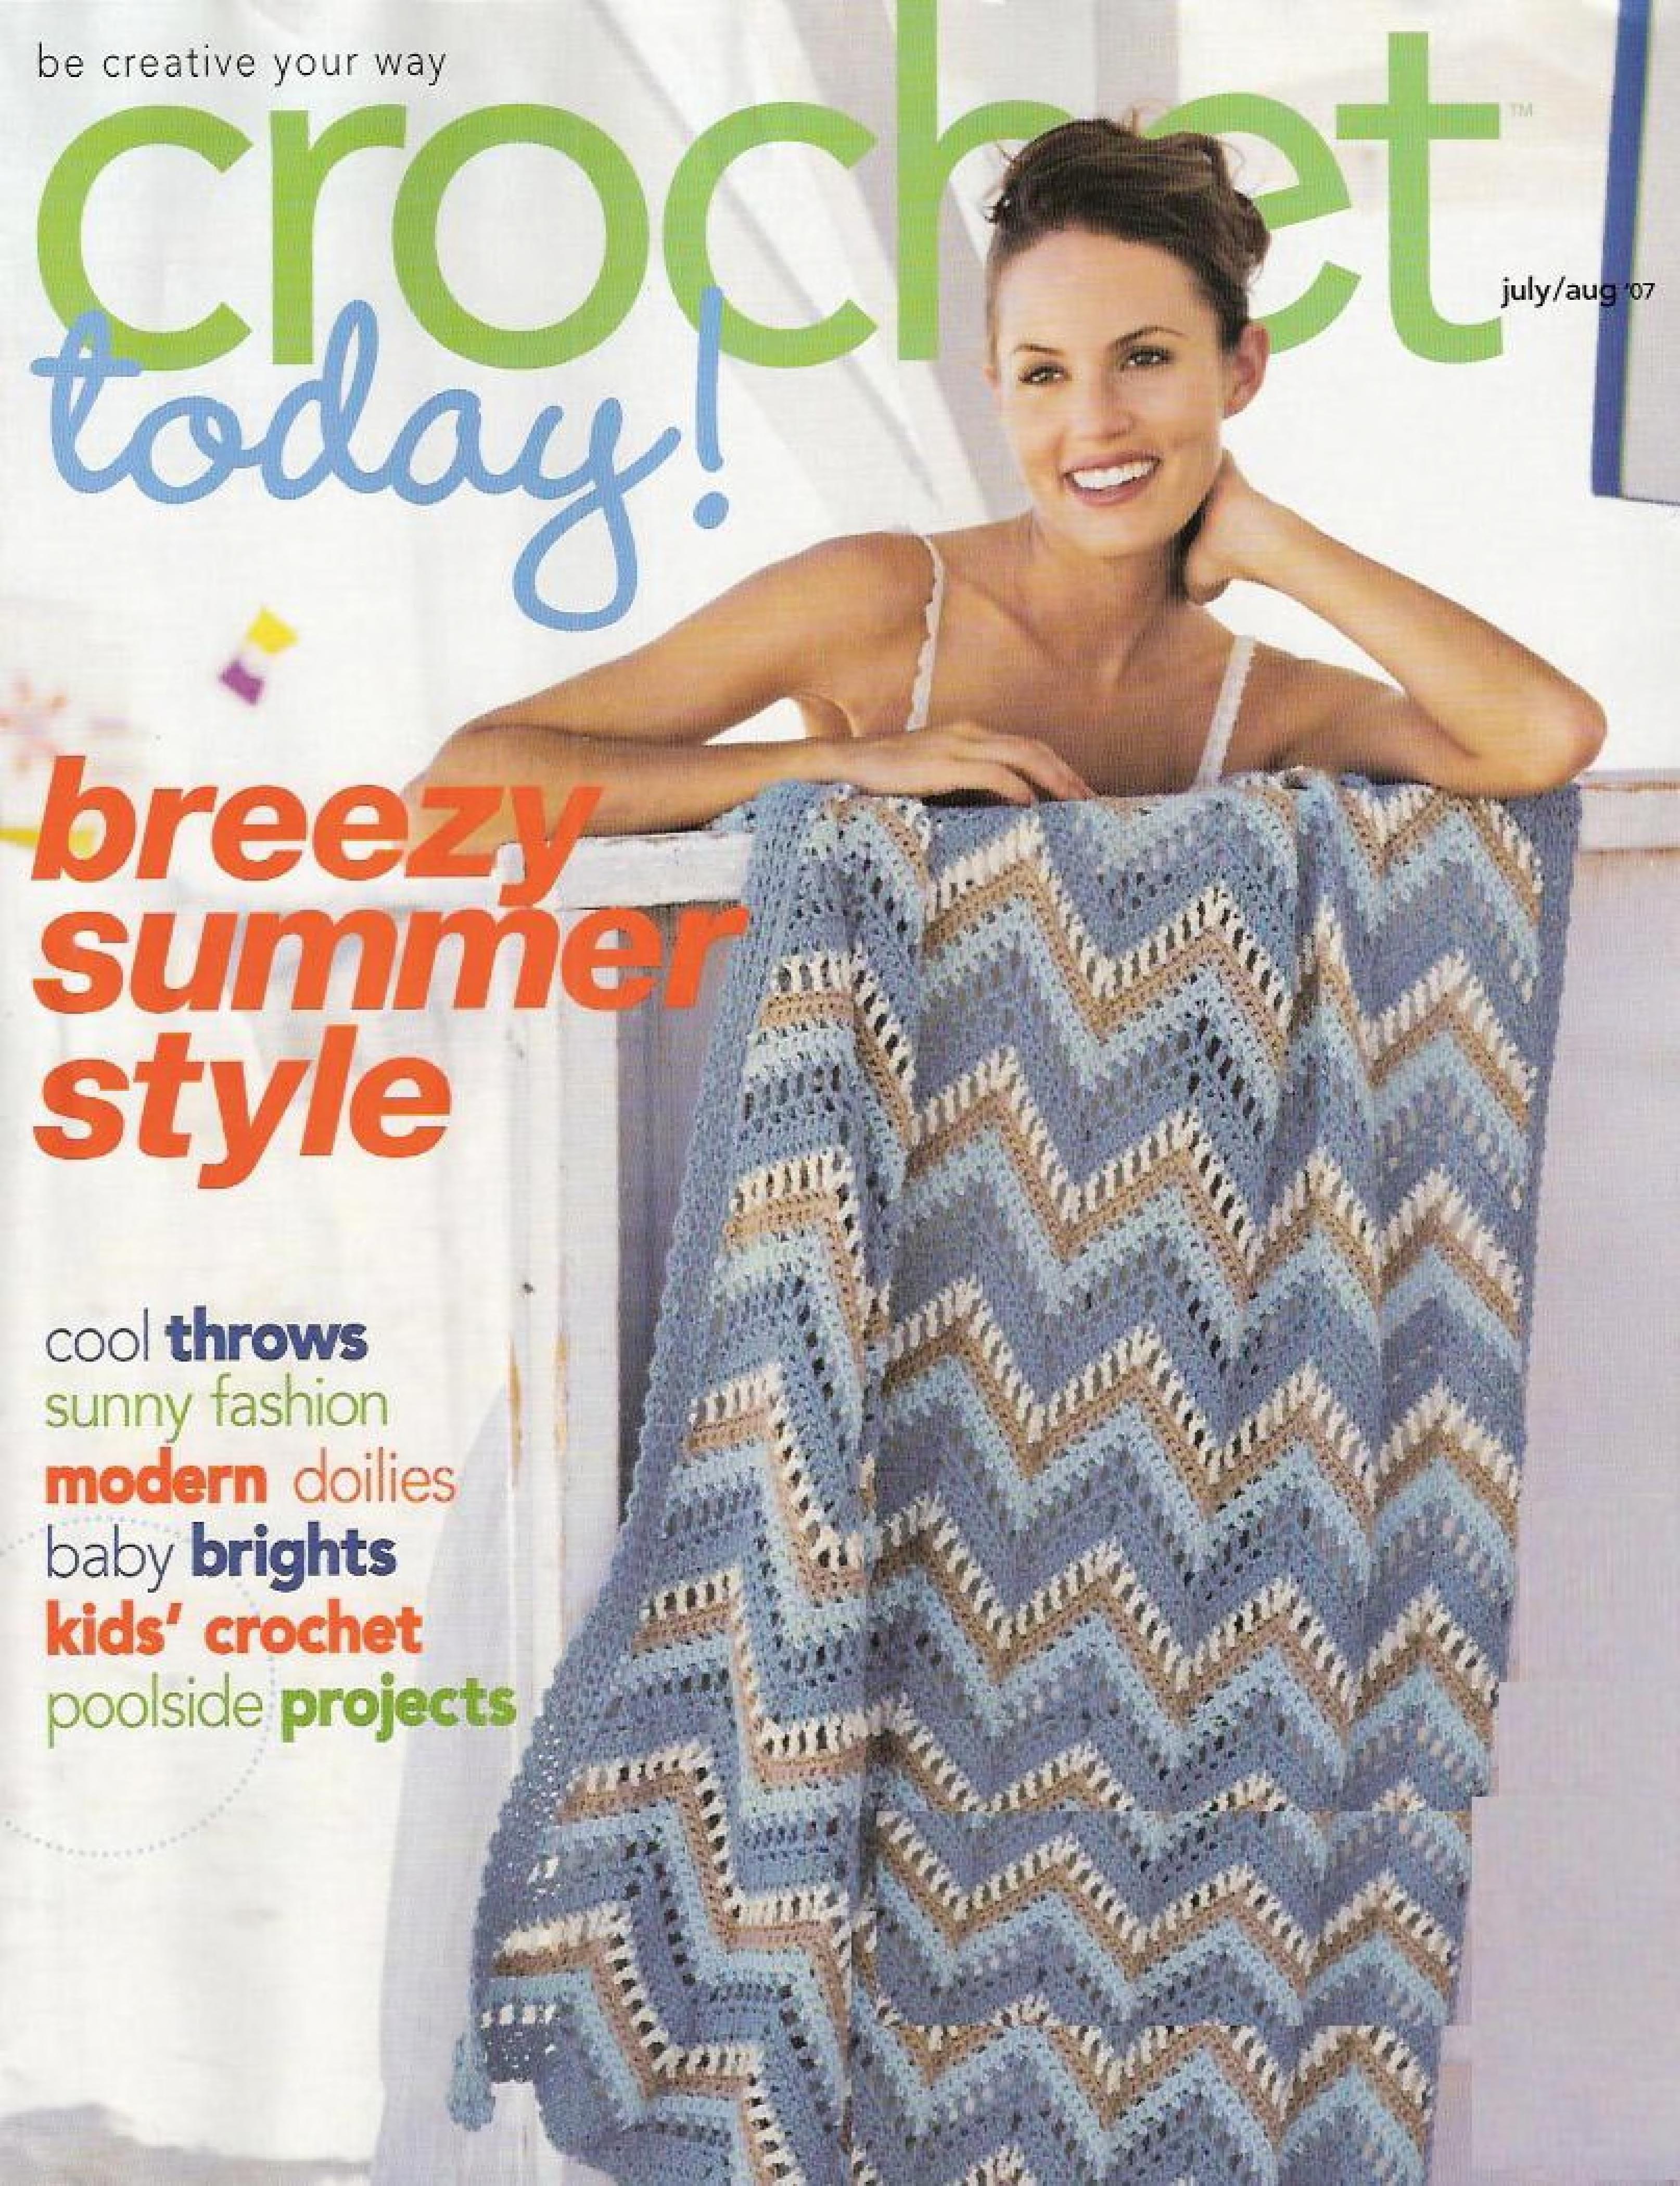 Crochet Today 2007-07: Crochet Today: Téléchargement, emprunt et streaming gratuits: Internet Archive   – Crochet patterns